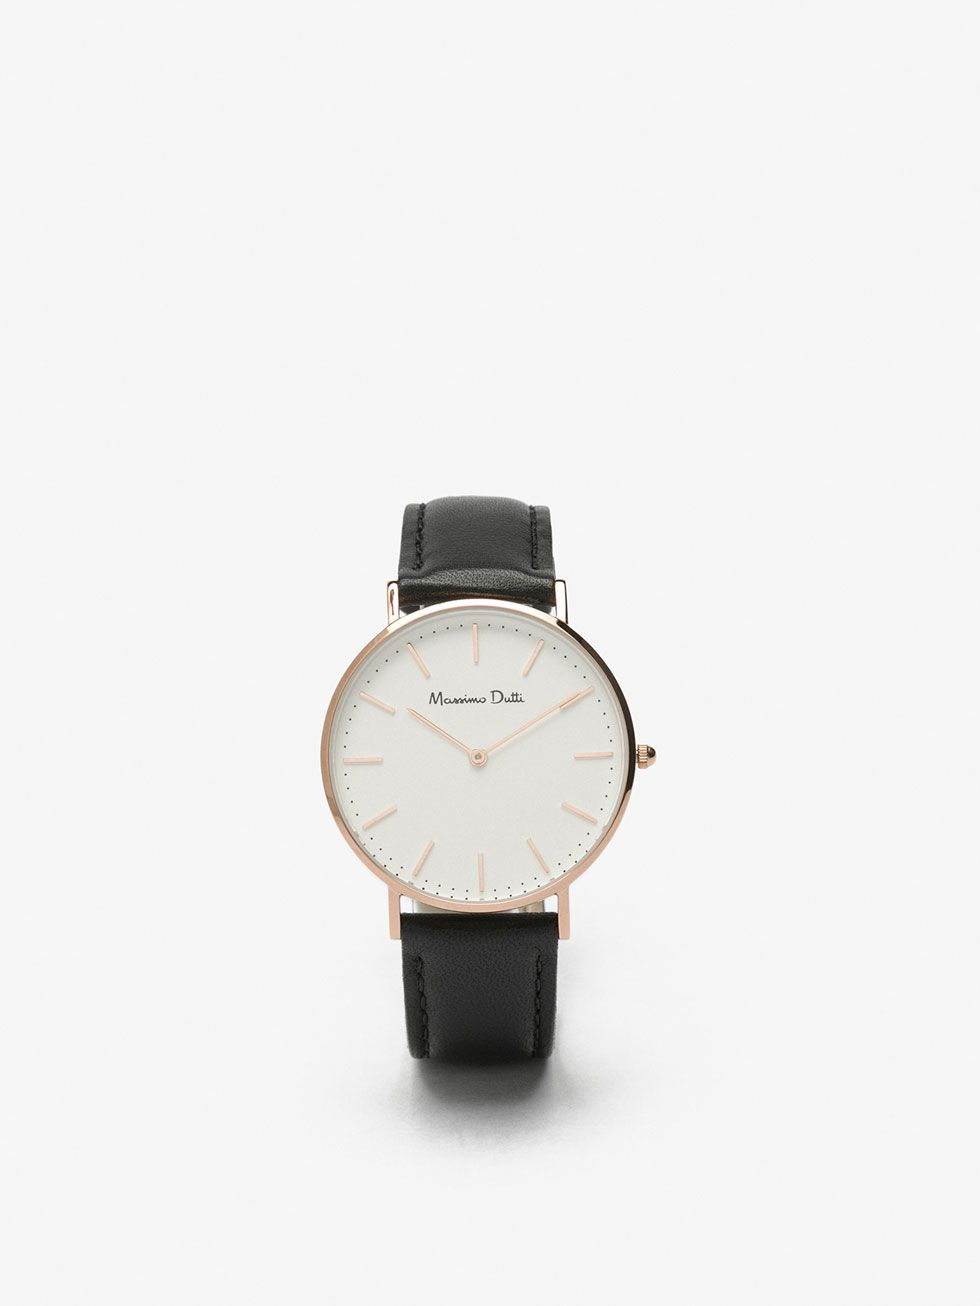 057fc99d7d89 Relojes - Accesorios - MUJER - Massimo Dutti España